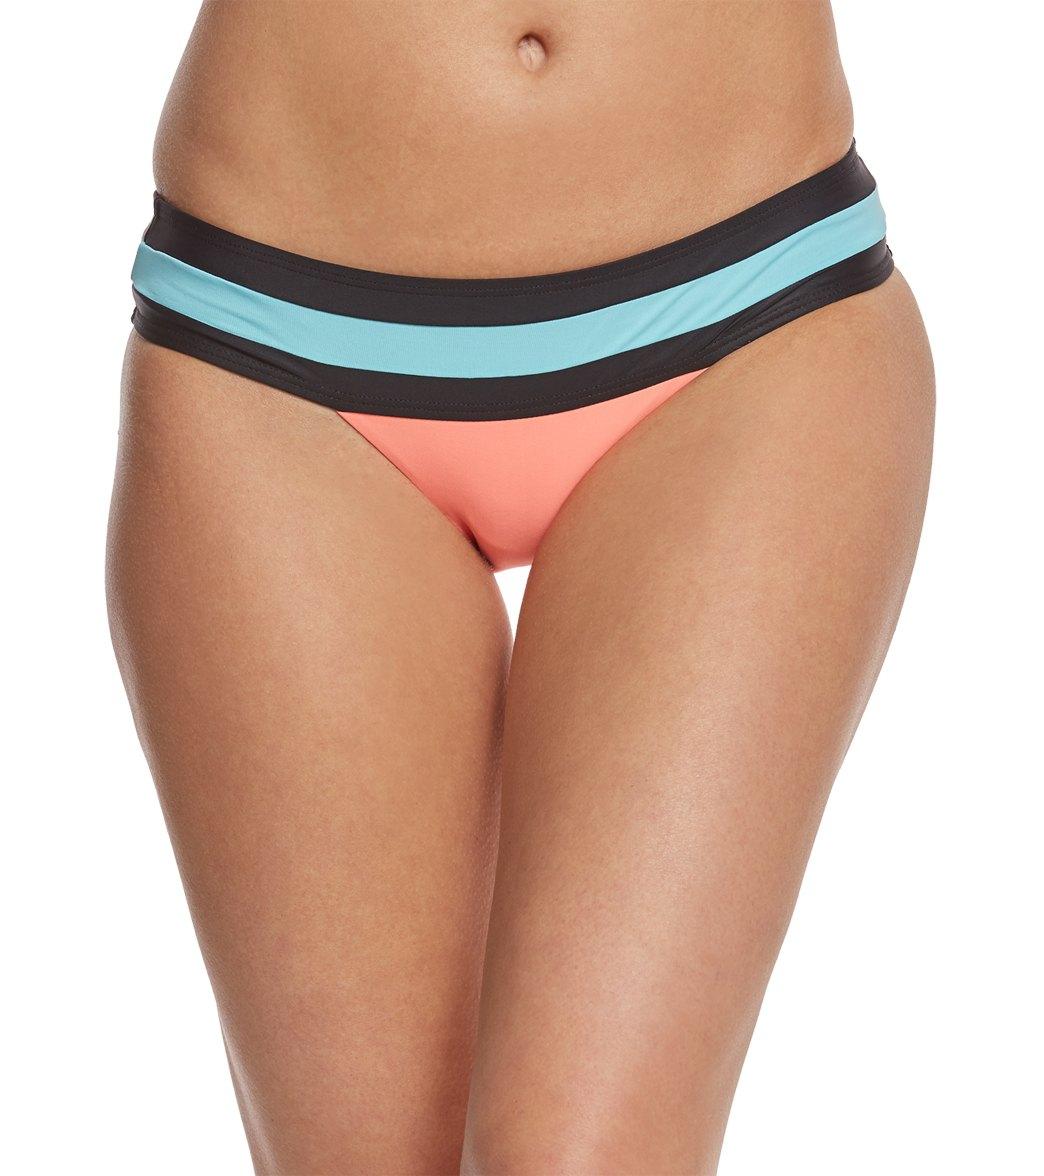 1afc3bc2098 PilyQ Swimwear Coral Banded Color Block Teeny Bikini Bottom at  SwimOutlet.com - Free Shipping